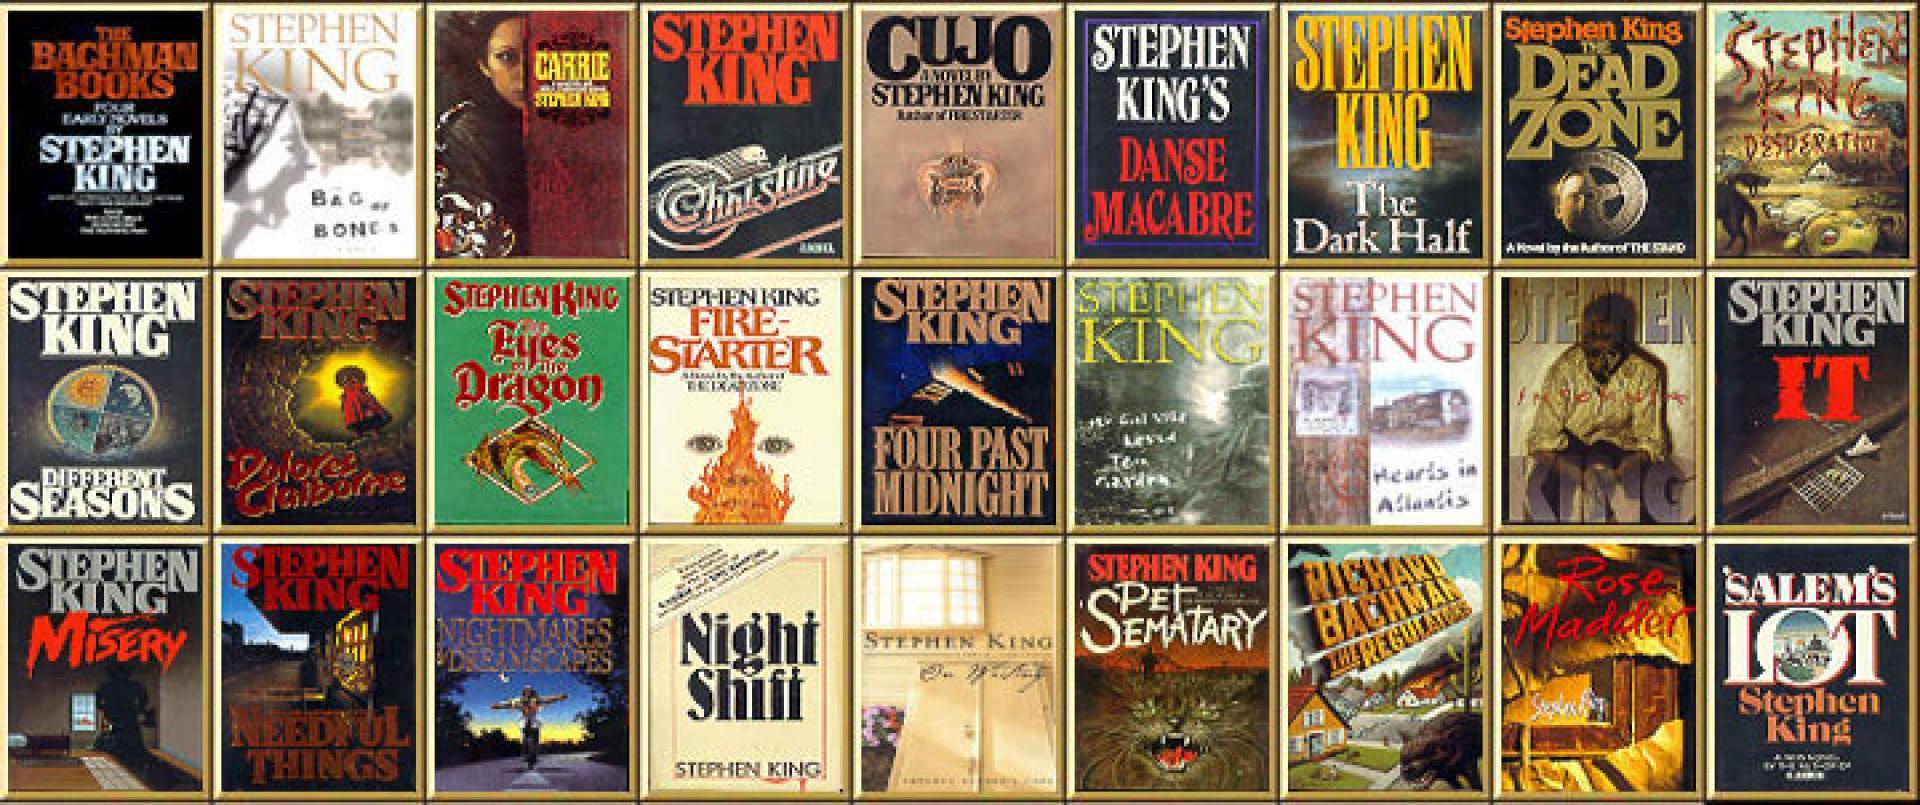 Stephen King: Lisey története - Lisey's Story (2006)